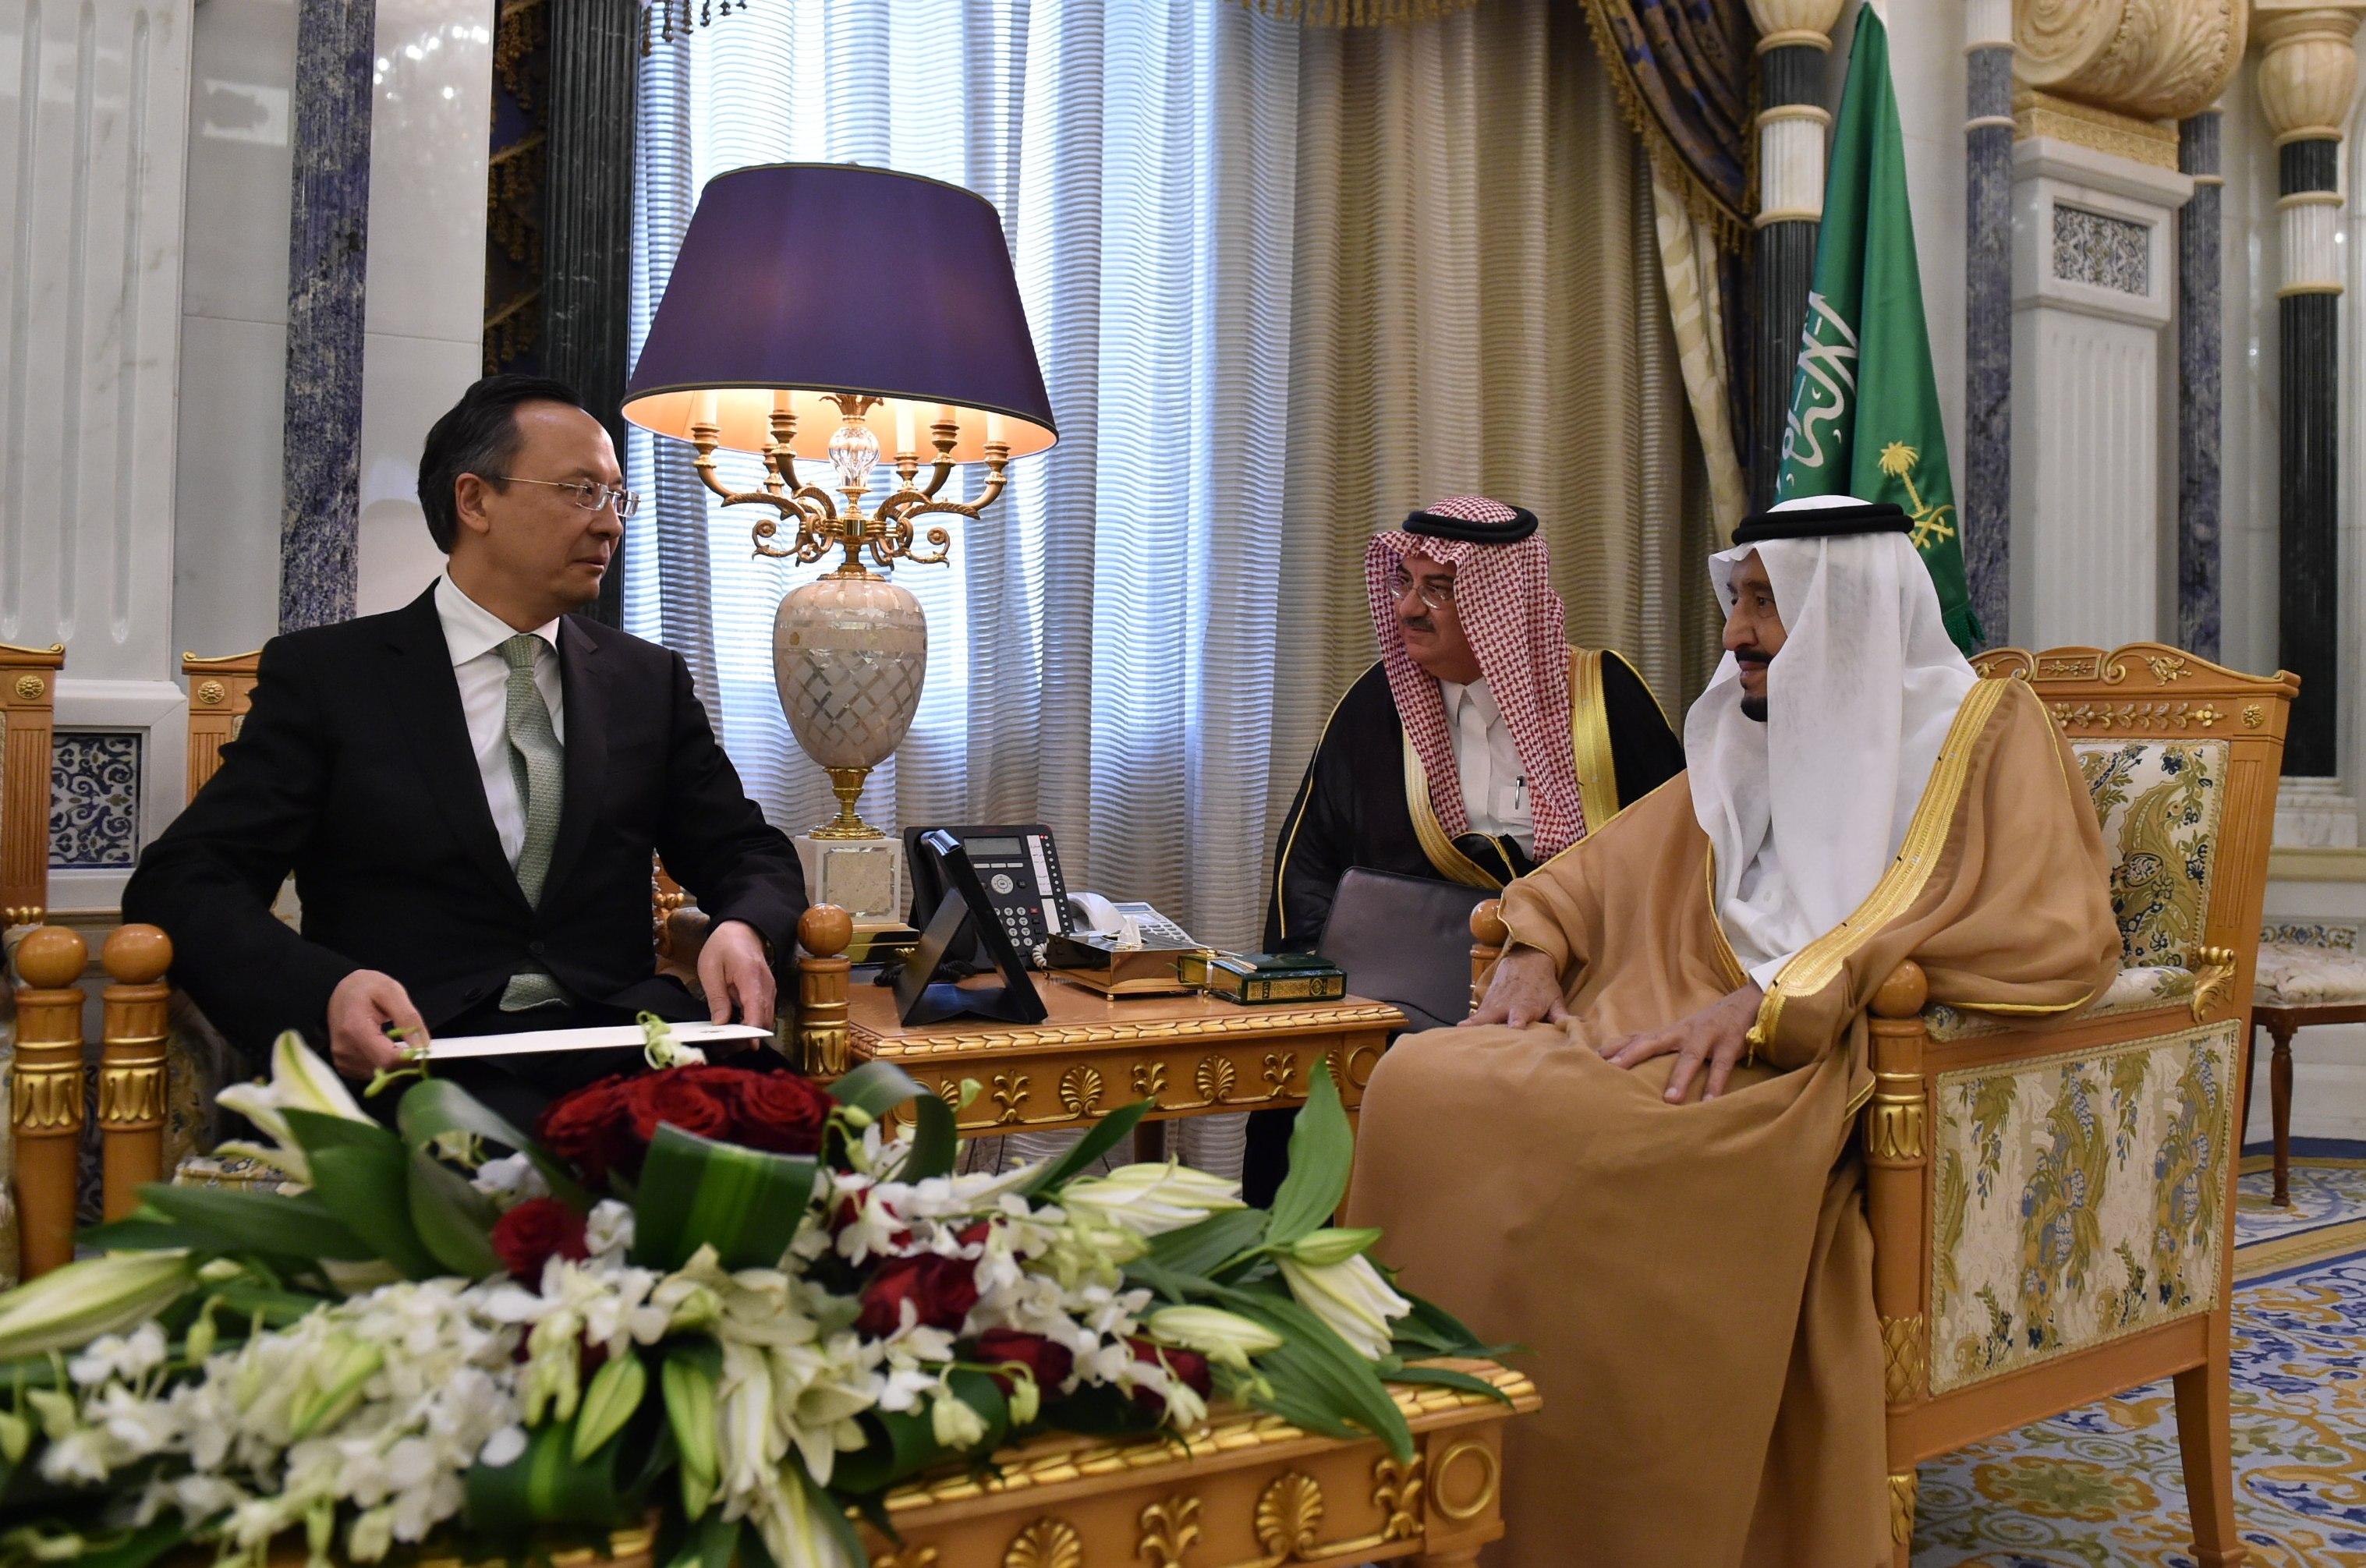 Kazakh President invites King of Saudi Arabia to OIC Summit in Astana